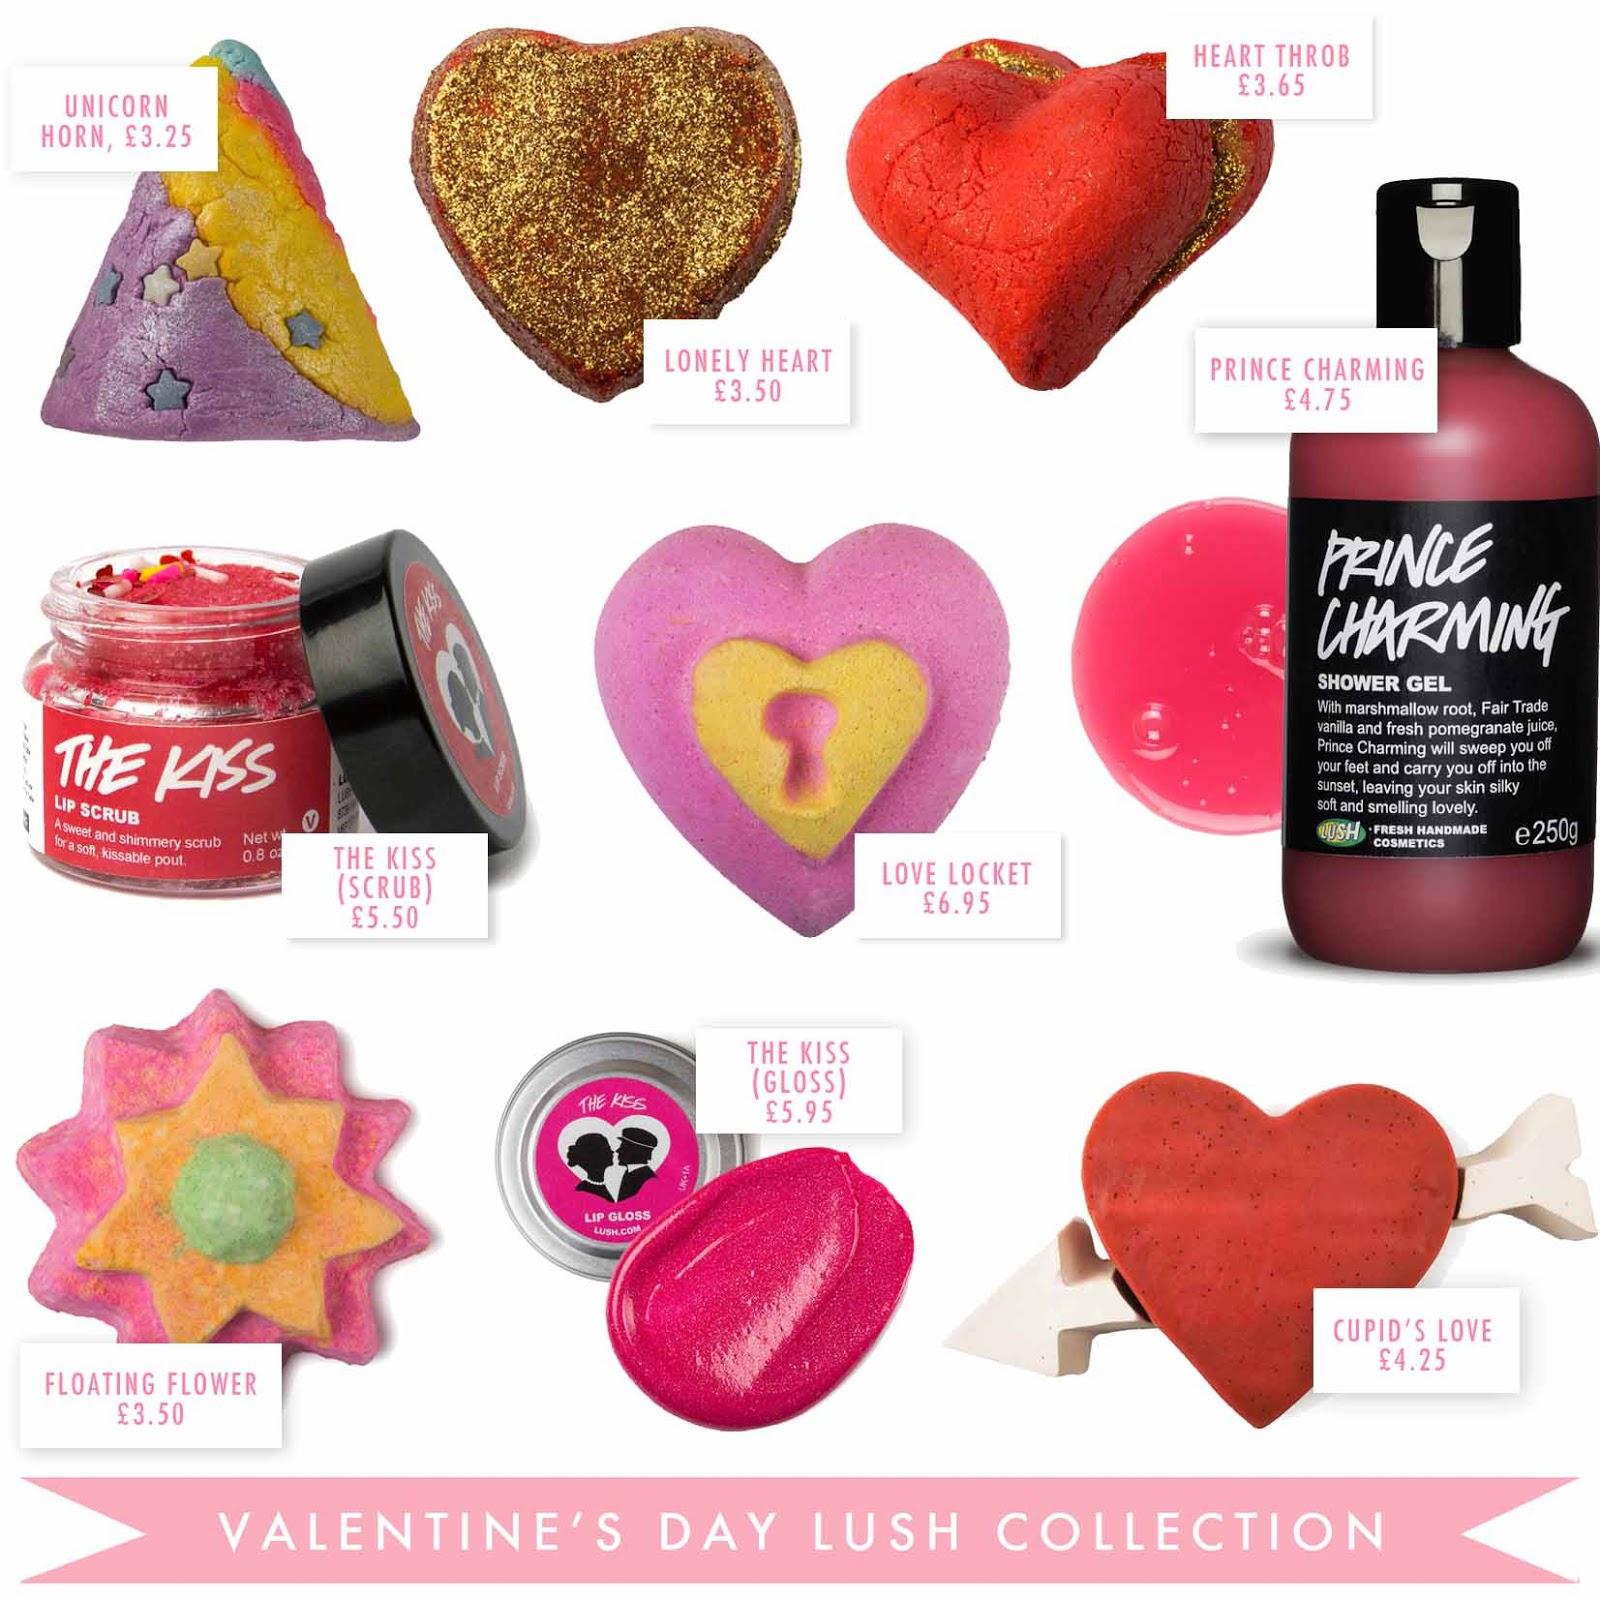 lush valentines day 2015, lush valentines 2015